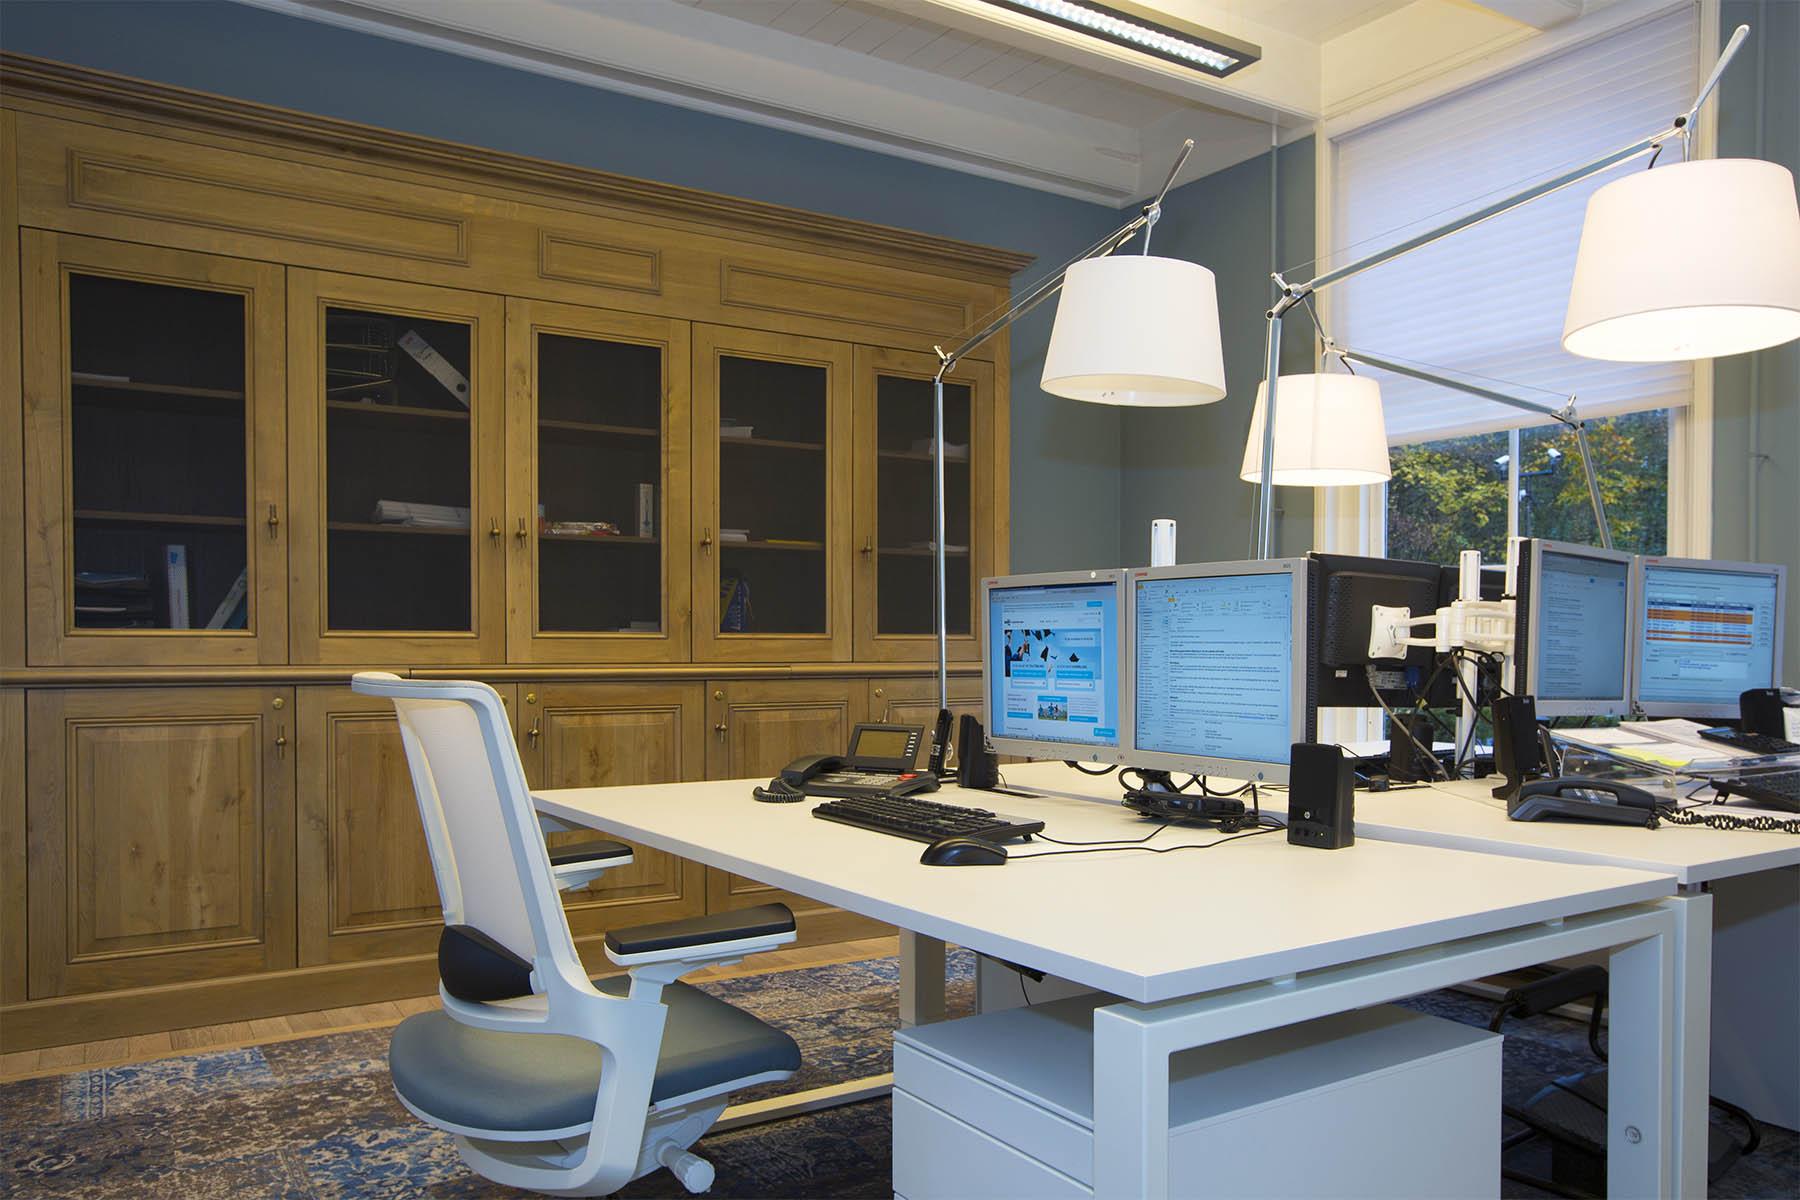 Oom-verzekeringen-interieurconcept-suzanne-holtz-studio-015-fotografie-Matthijs-Borghgraef